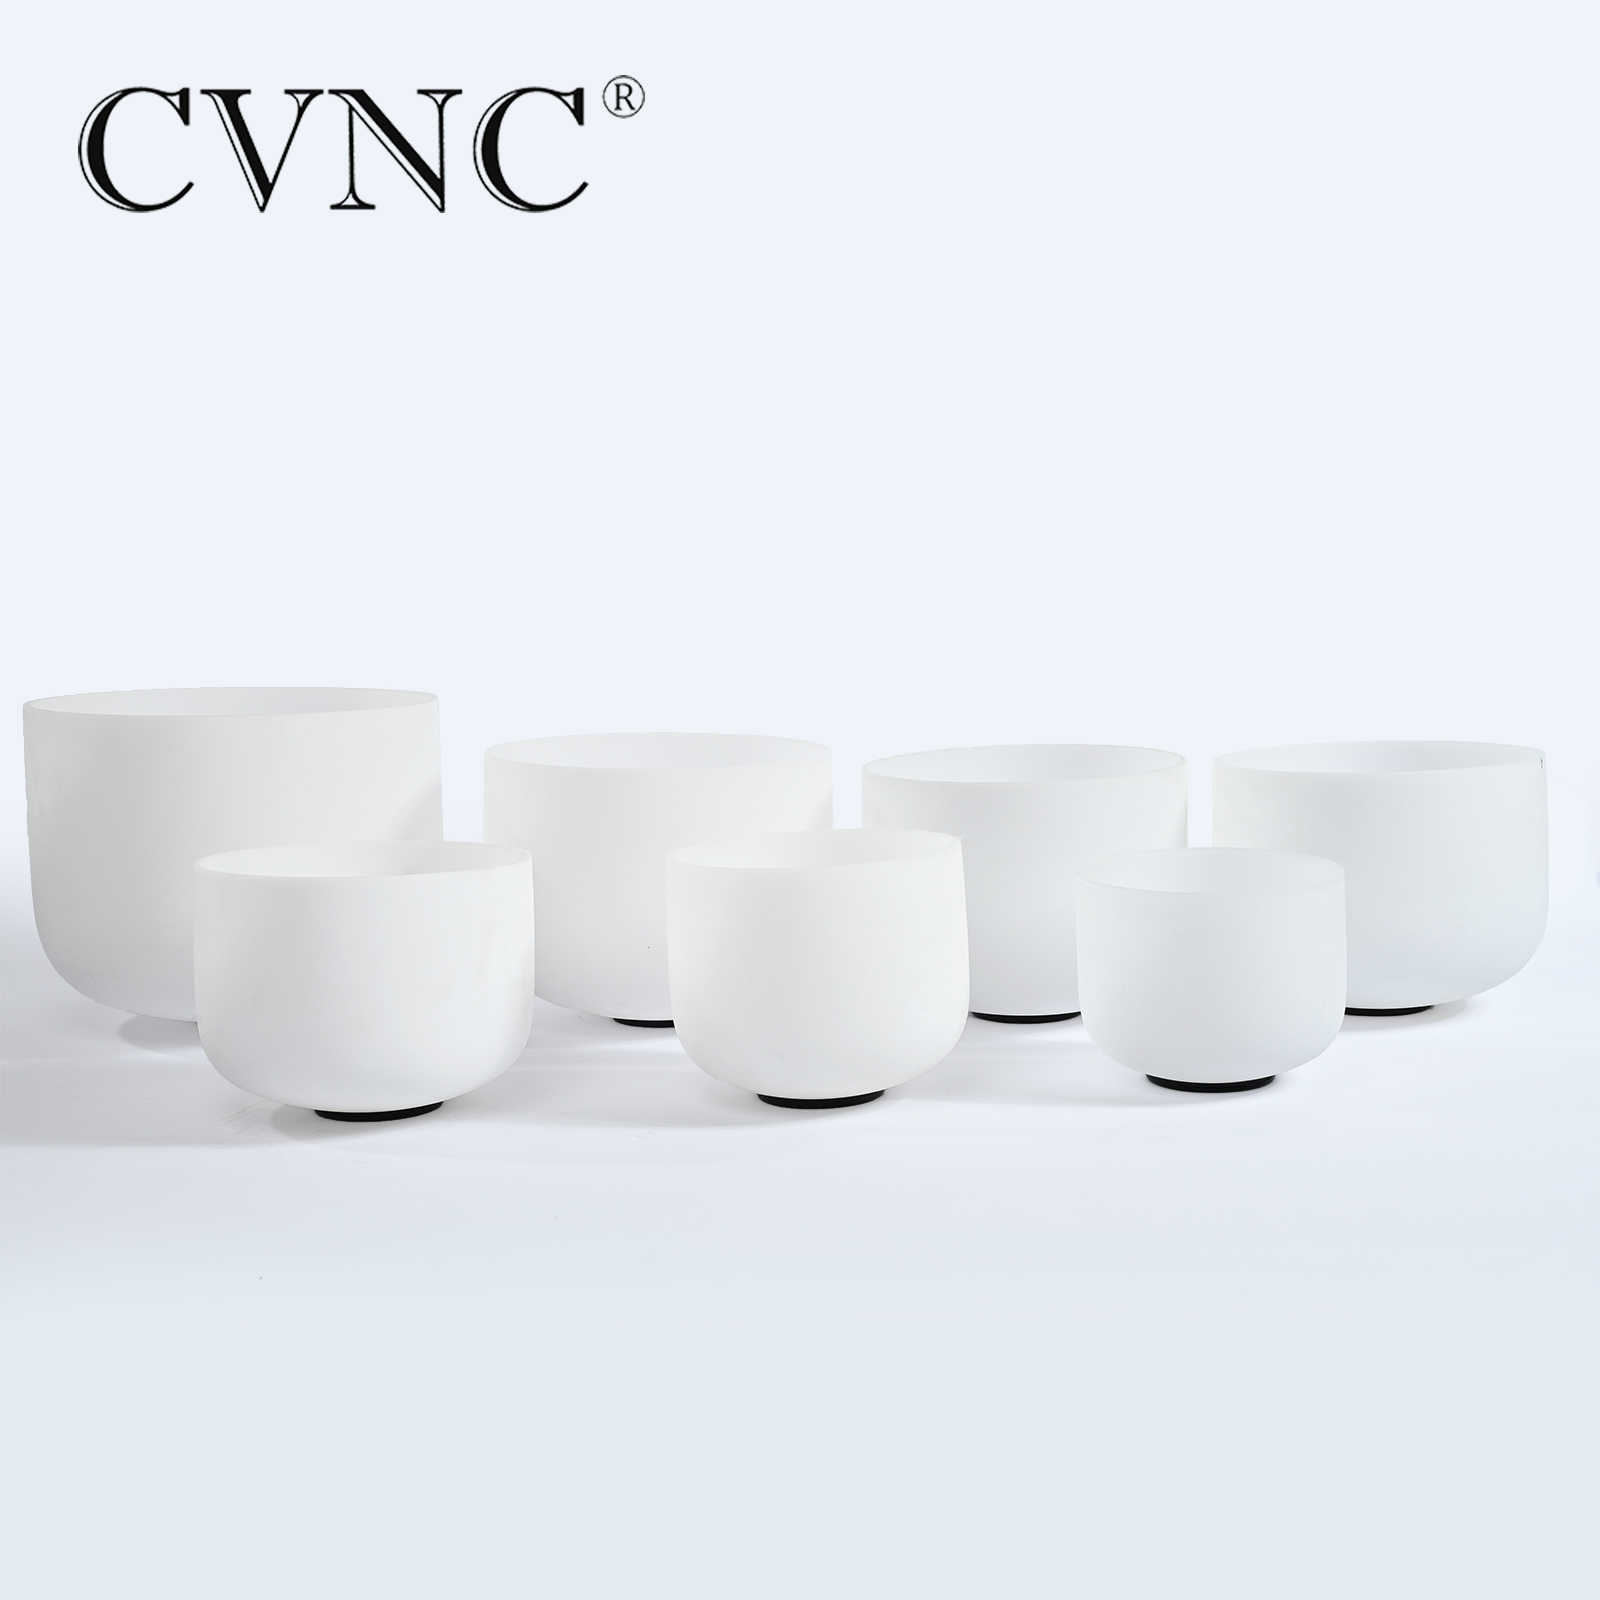 "CVNC 6 ""-12"" Note CDEFGAB Набор из 7 шт. чакра Матовый Кварцевый Кристалл Поющая чаша"